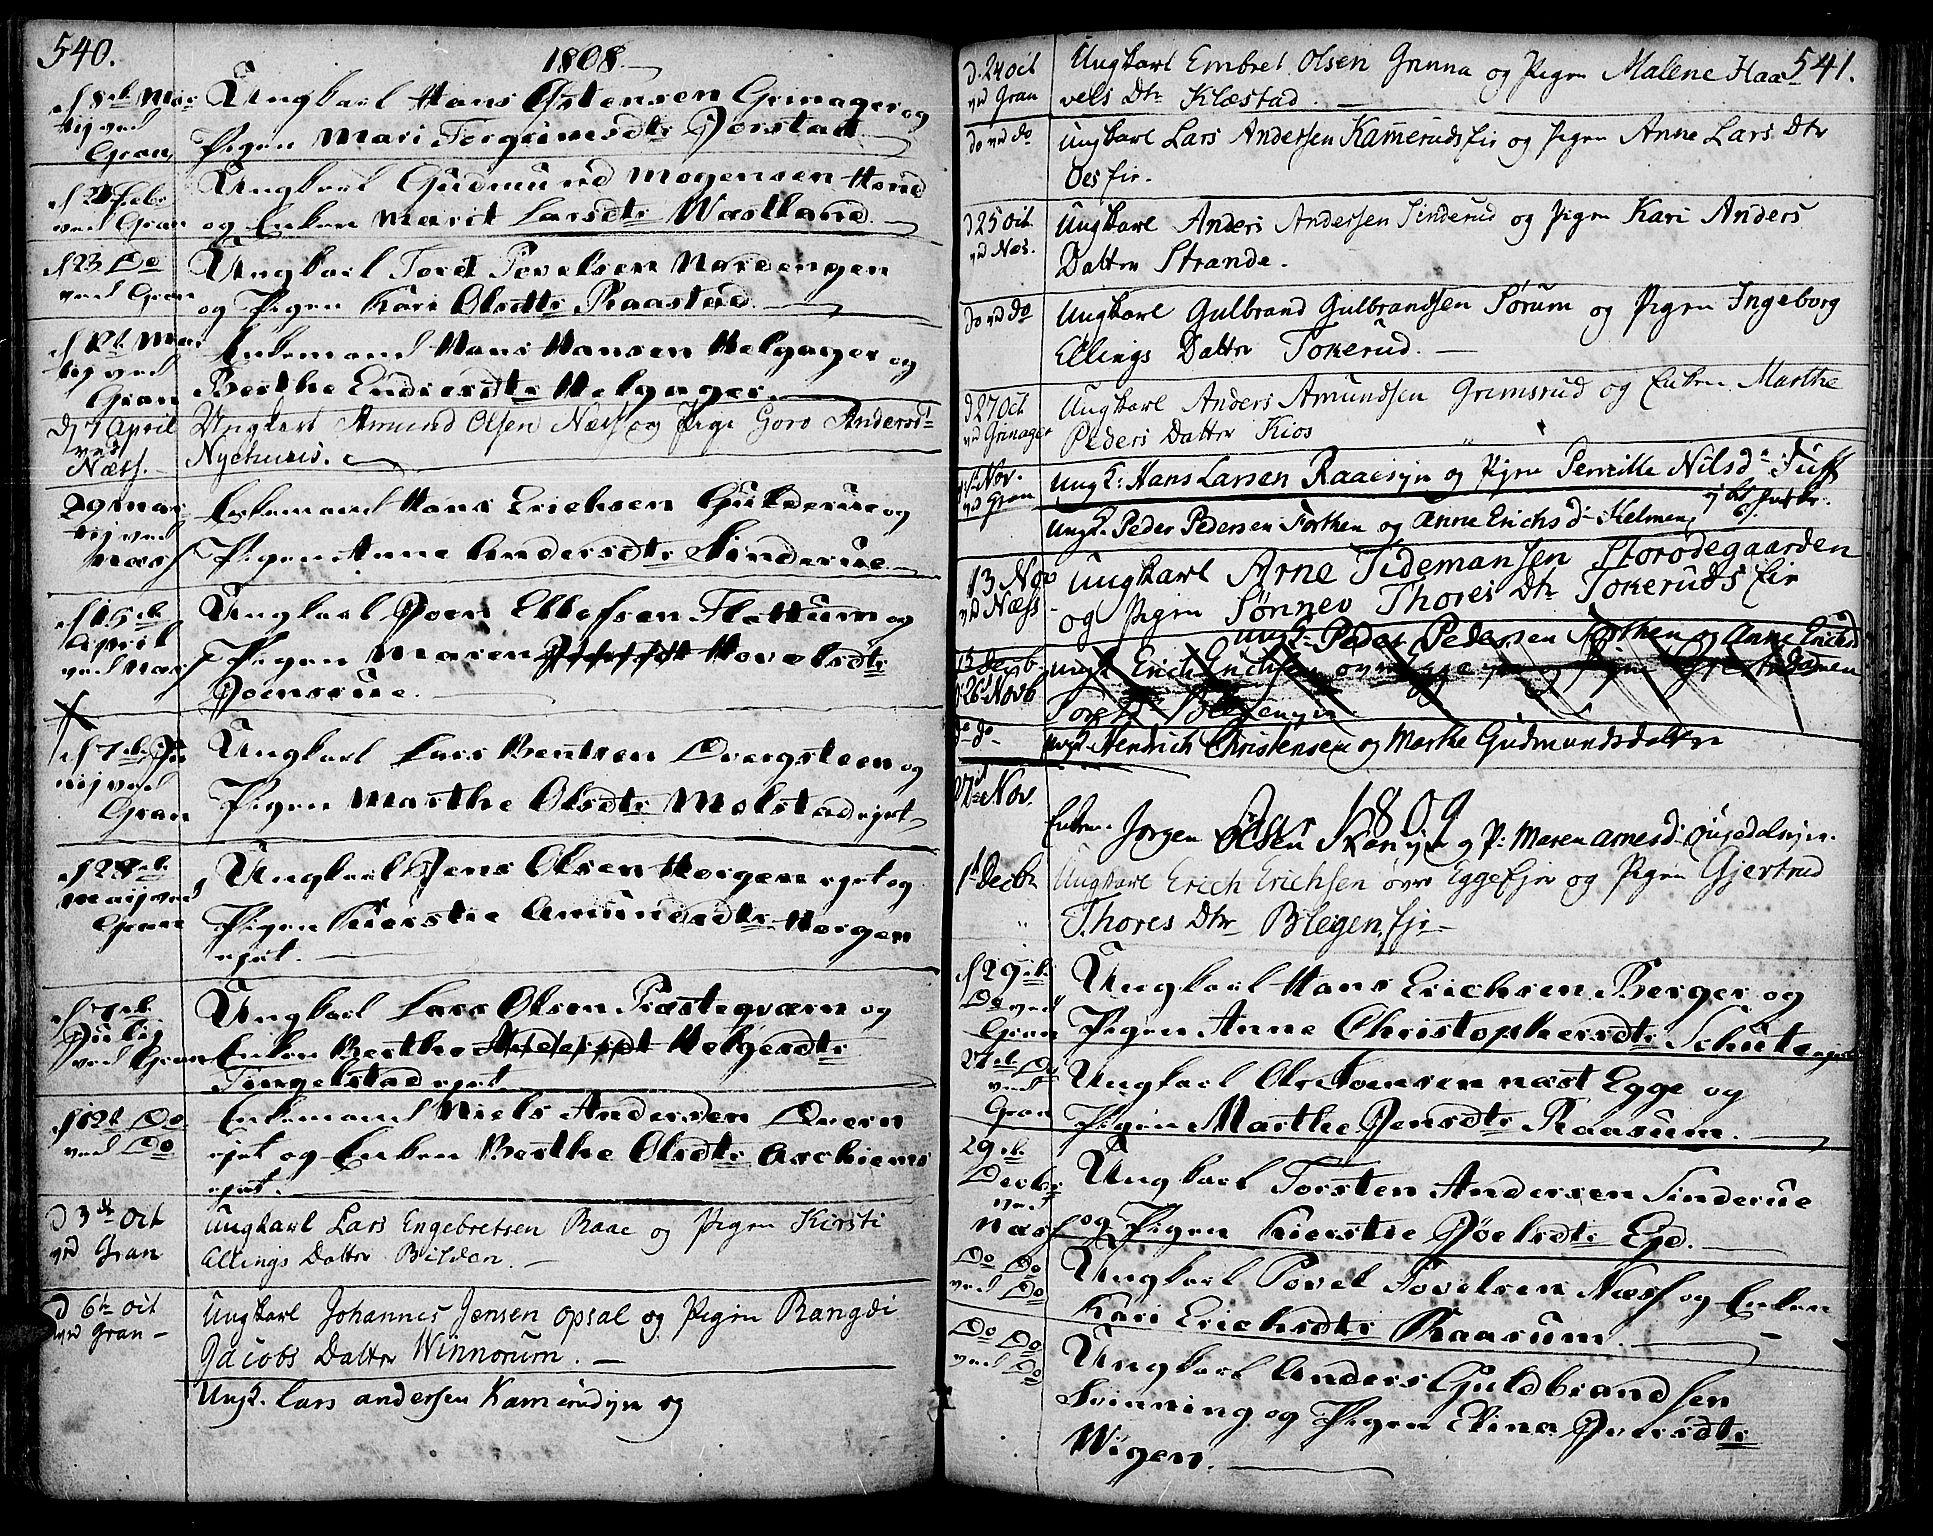 SAH, Gran prestekontor, Ministerialbok nr. 6, 1787-1824, s. 540-541